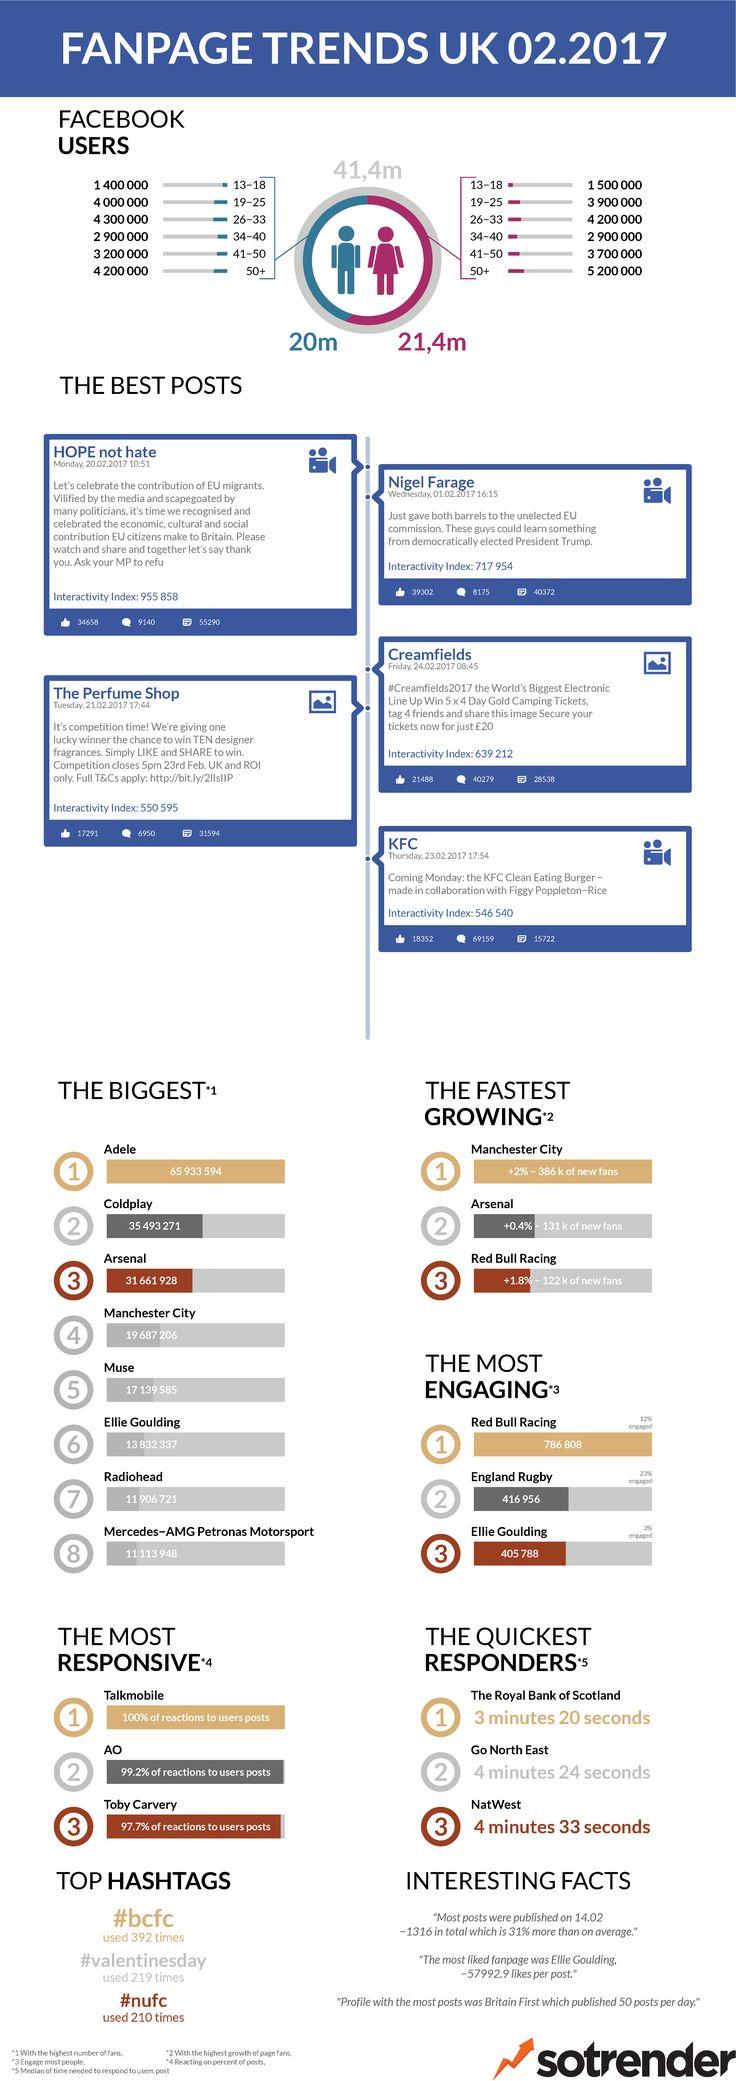 UK's Facebook in February 2017 - check FREE report: https://www.sotrender.com/blog/2017/03/fanpage-trends-uk-february-2017/  #socialmedia #facebook #trends